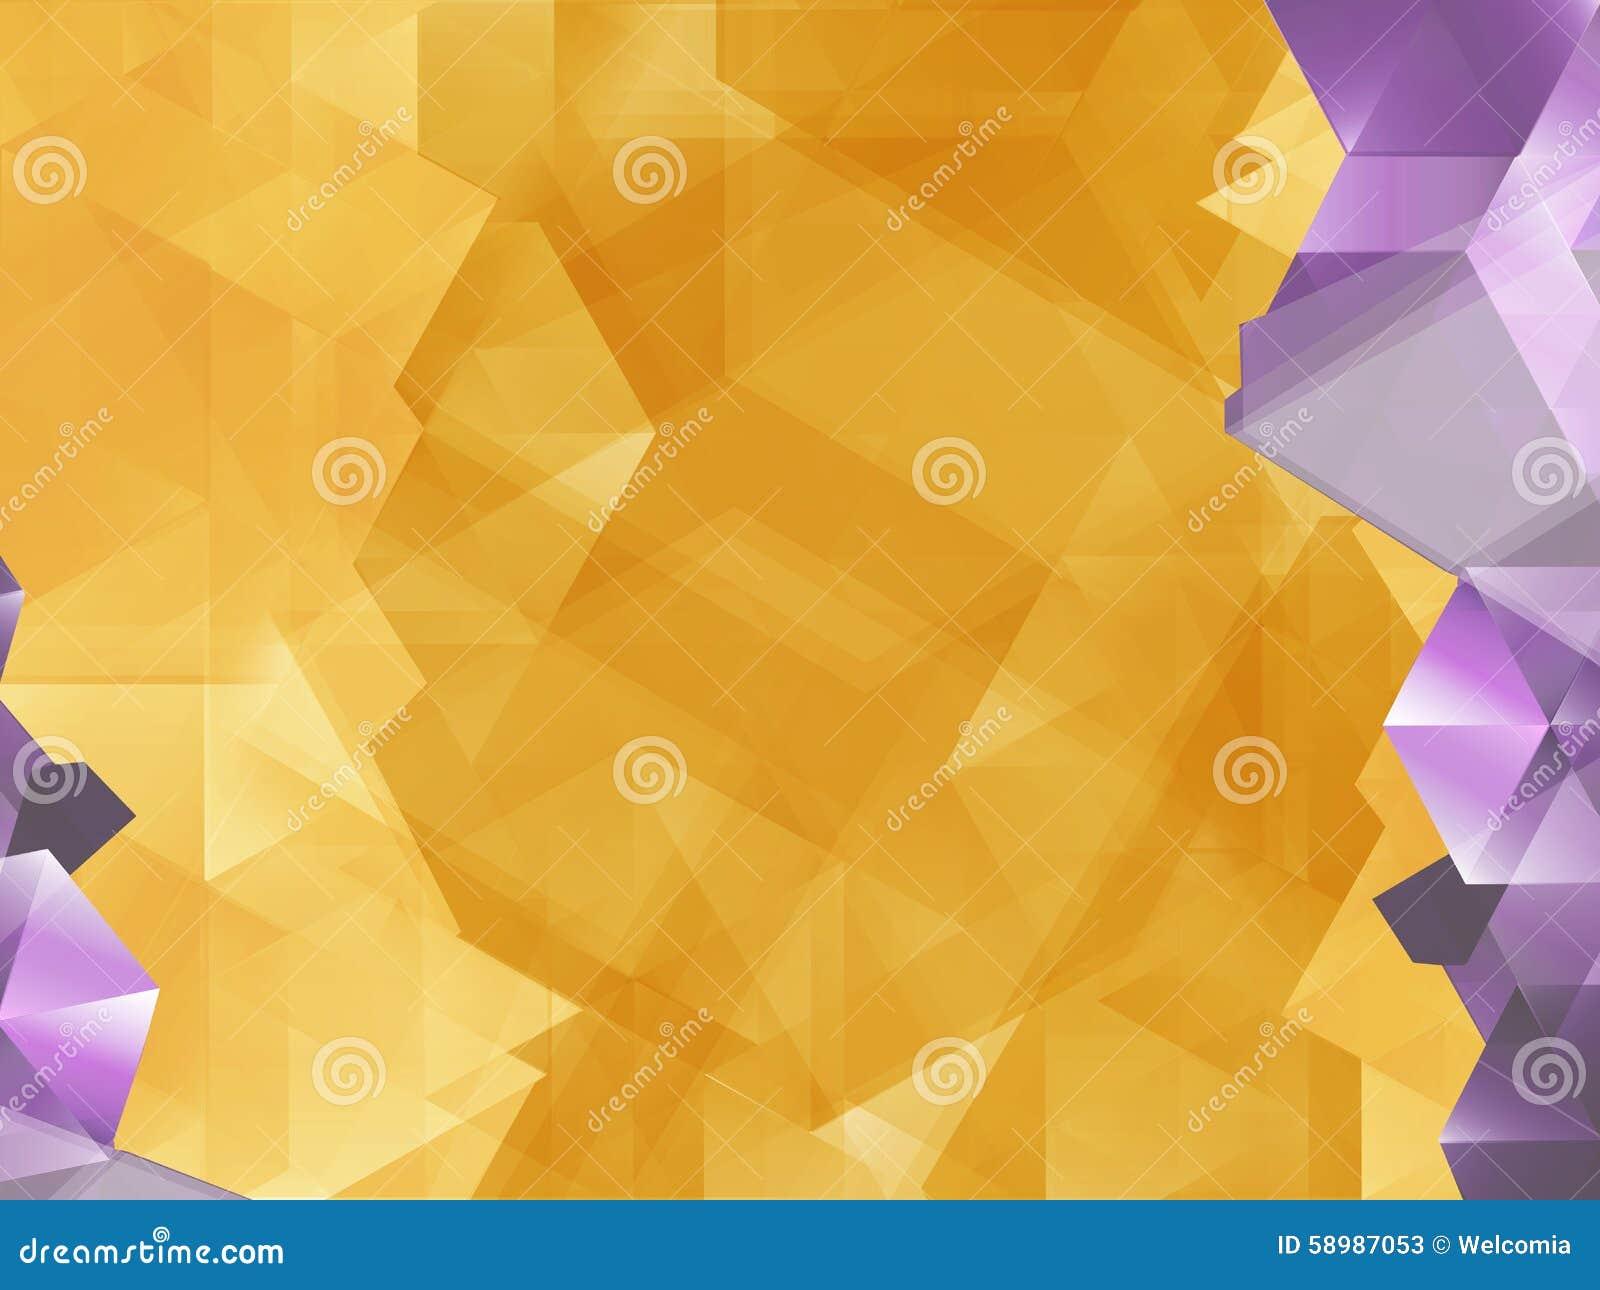 geometric yellow background illustration - photo #3